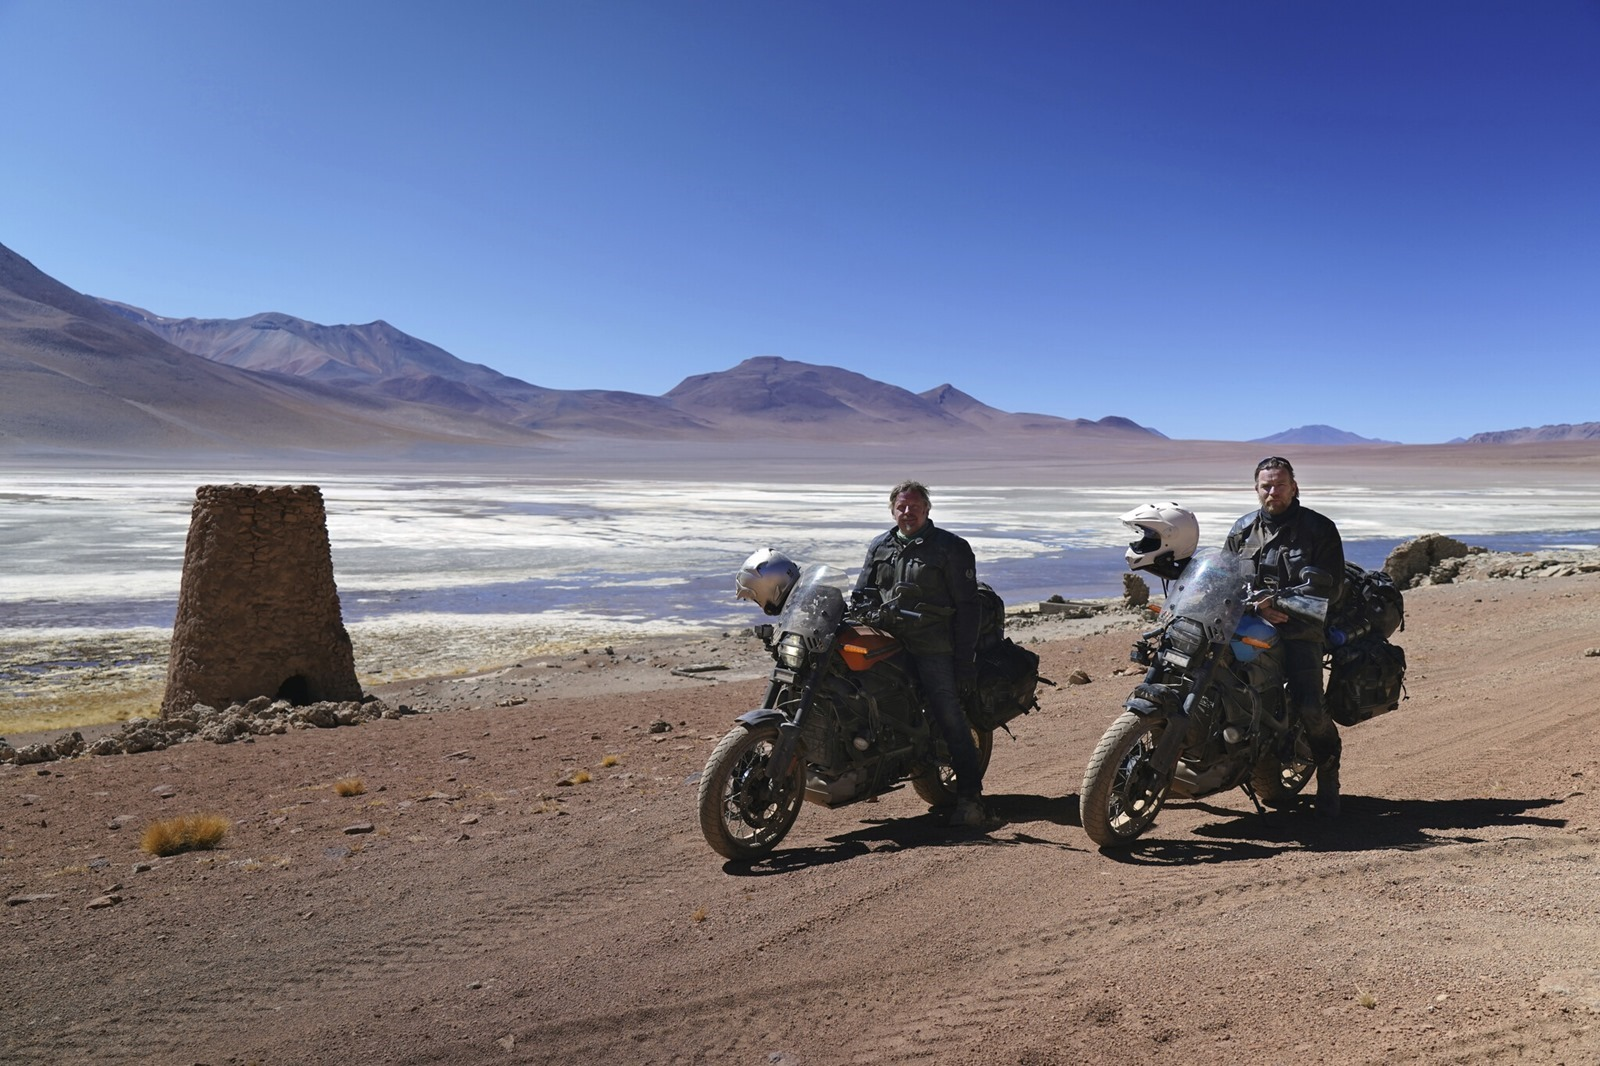 Apple TV+ 將播出伊旺麥奎格與查理布爾曼的全新電動摩托車環球長征之旅『Long Way Up』@3C 達人廖阿輝